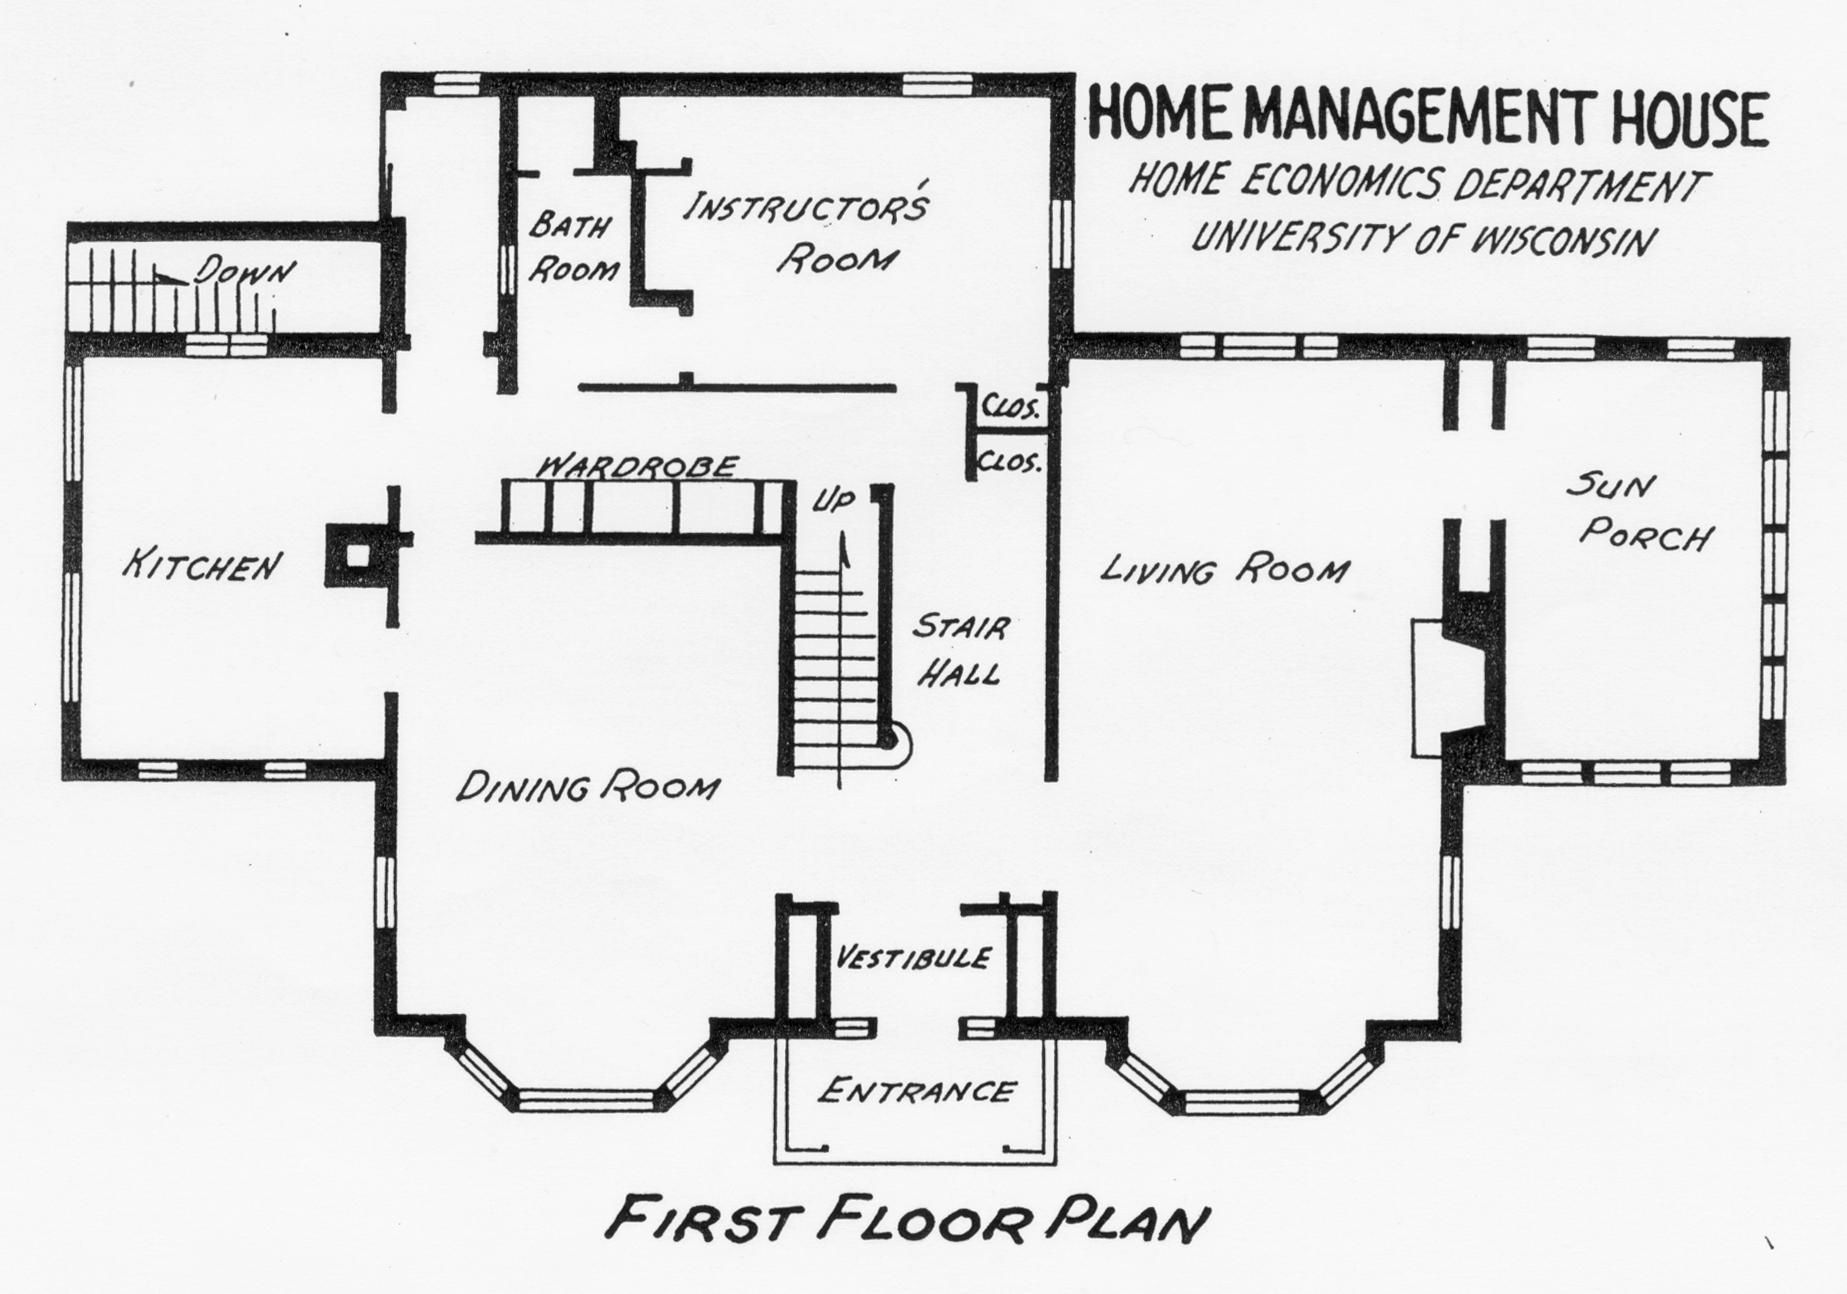 Home Management House 1940 floor plans